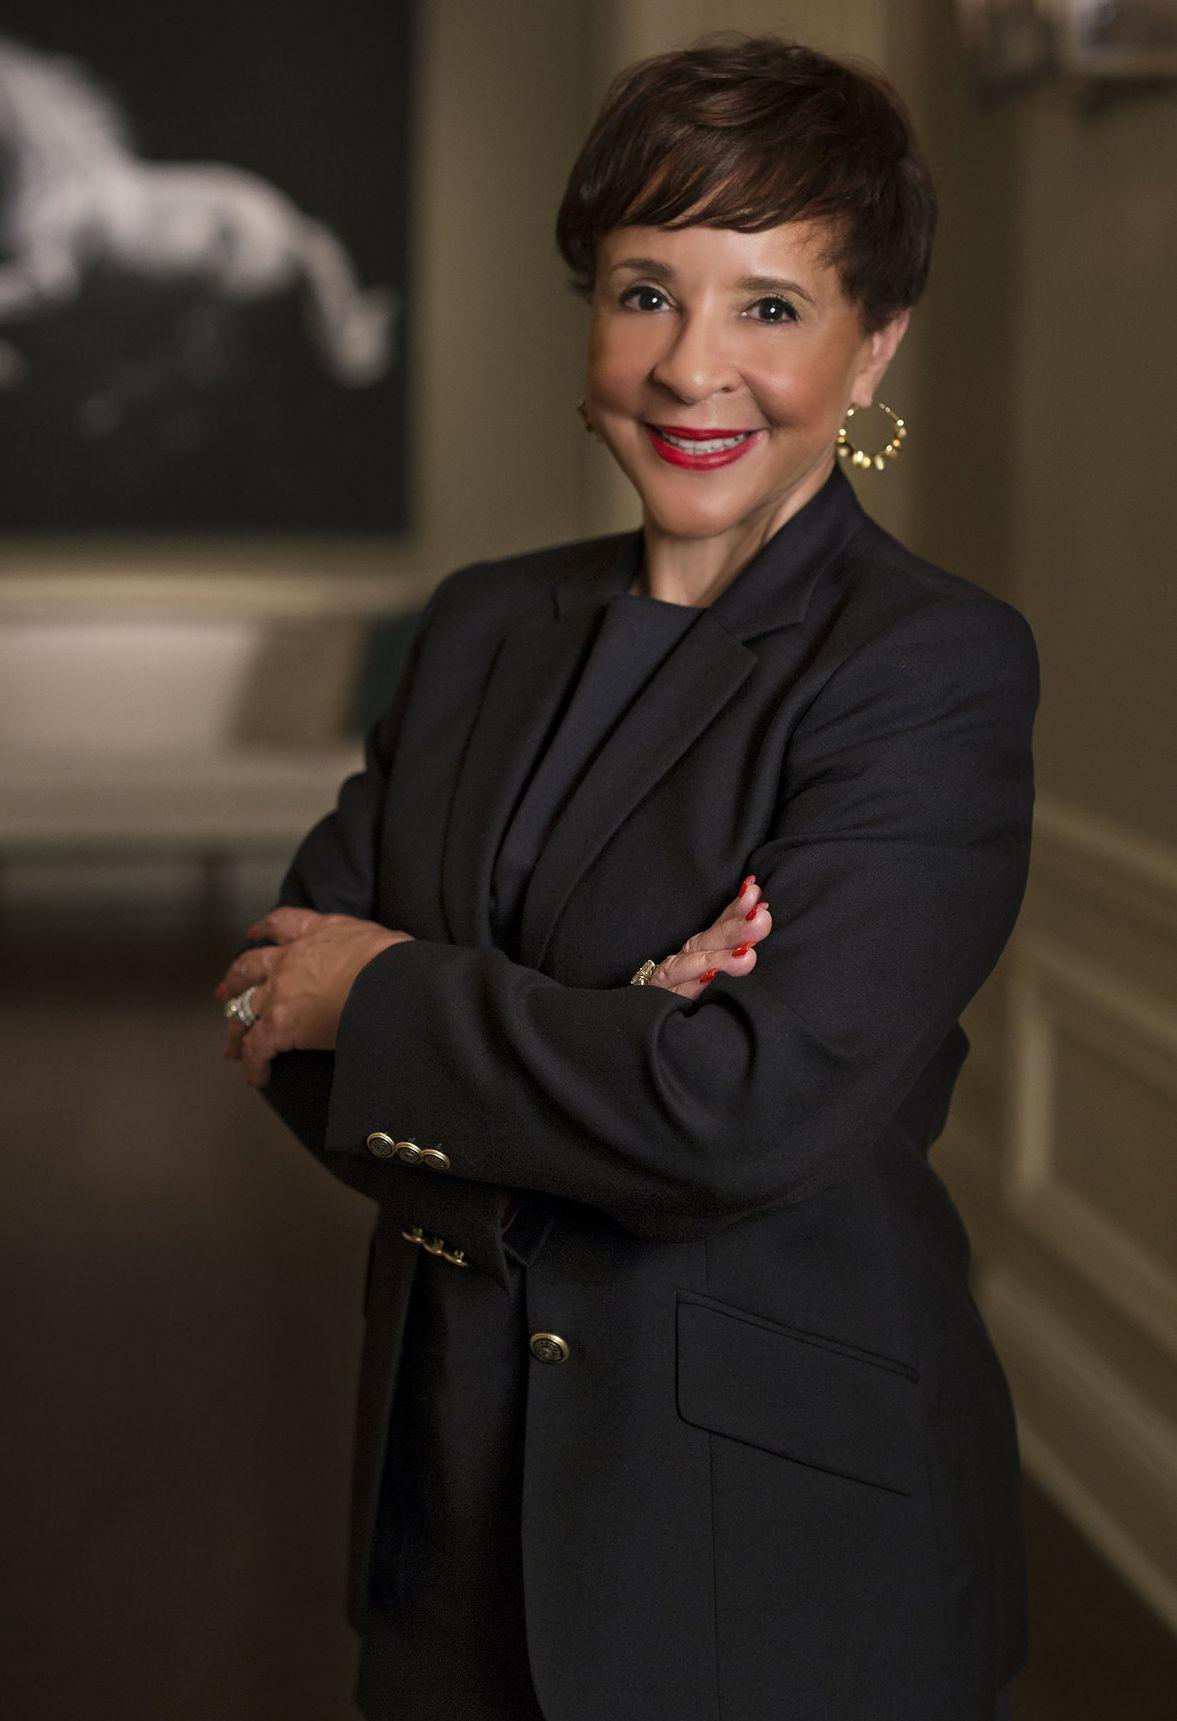 Sheila Crump Johnson